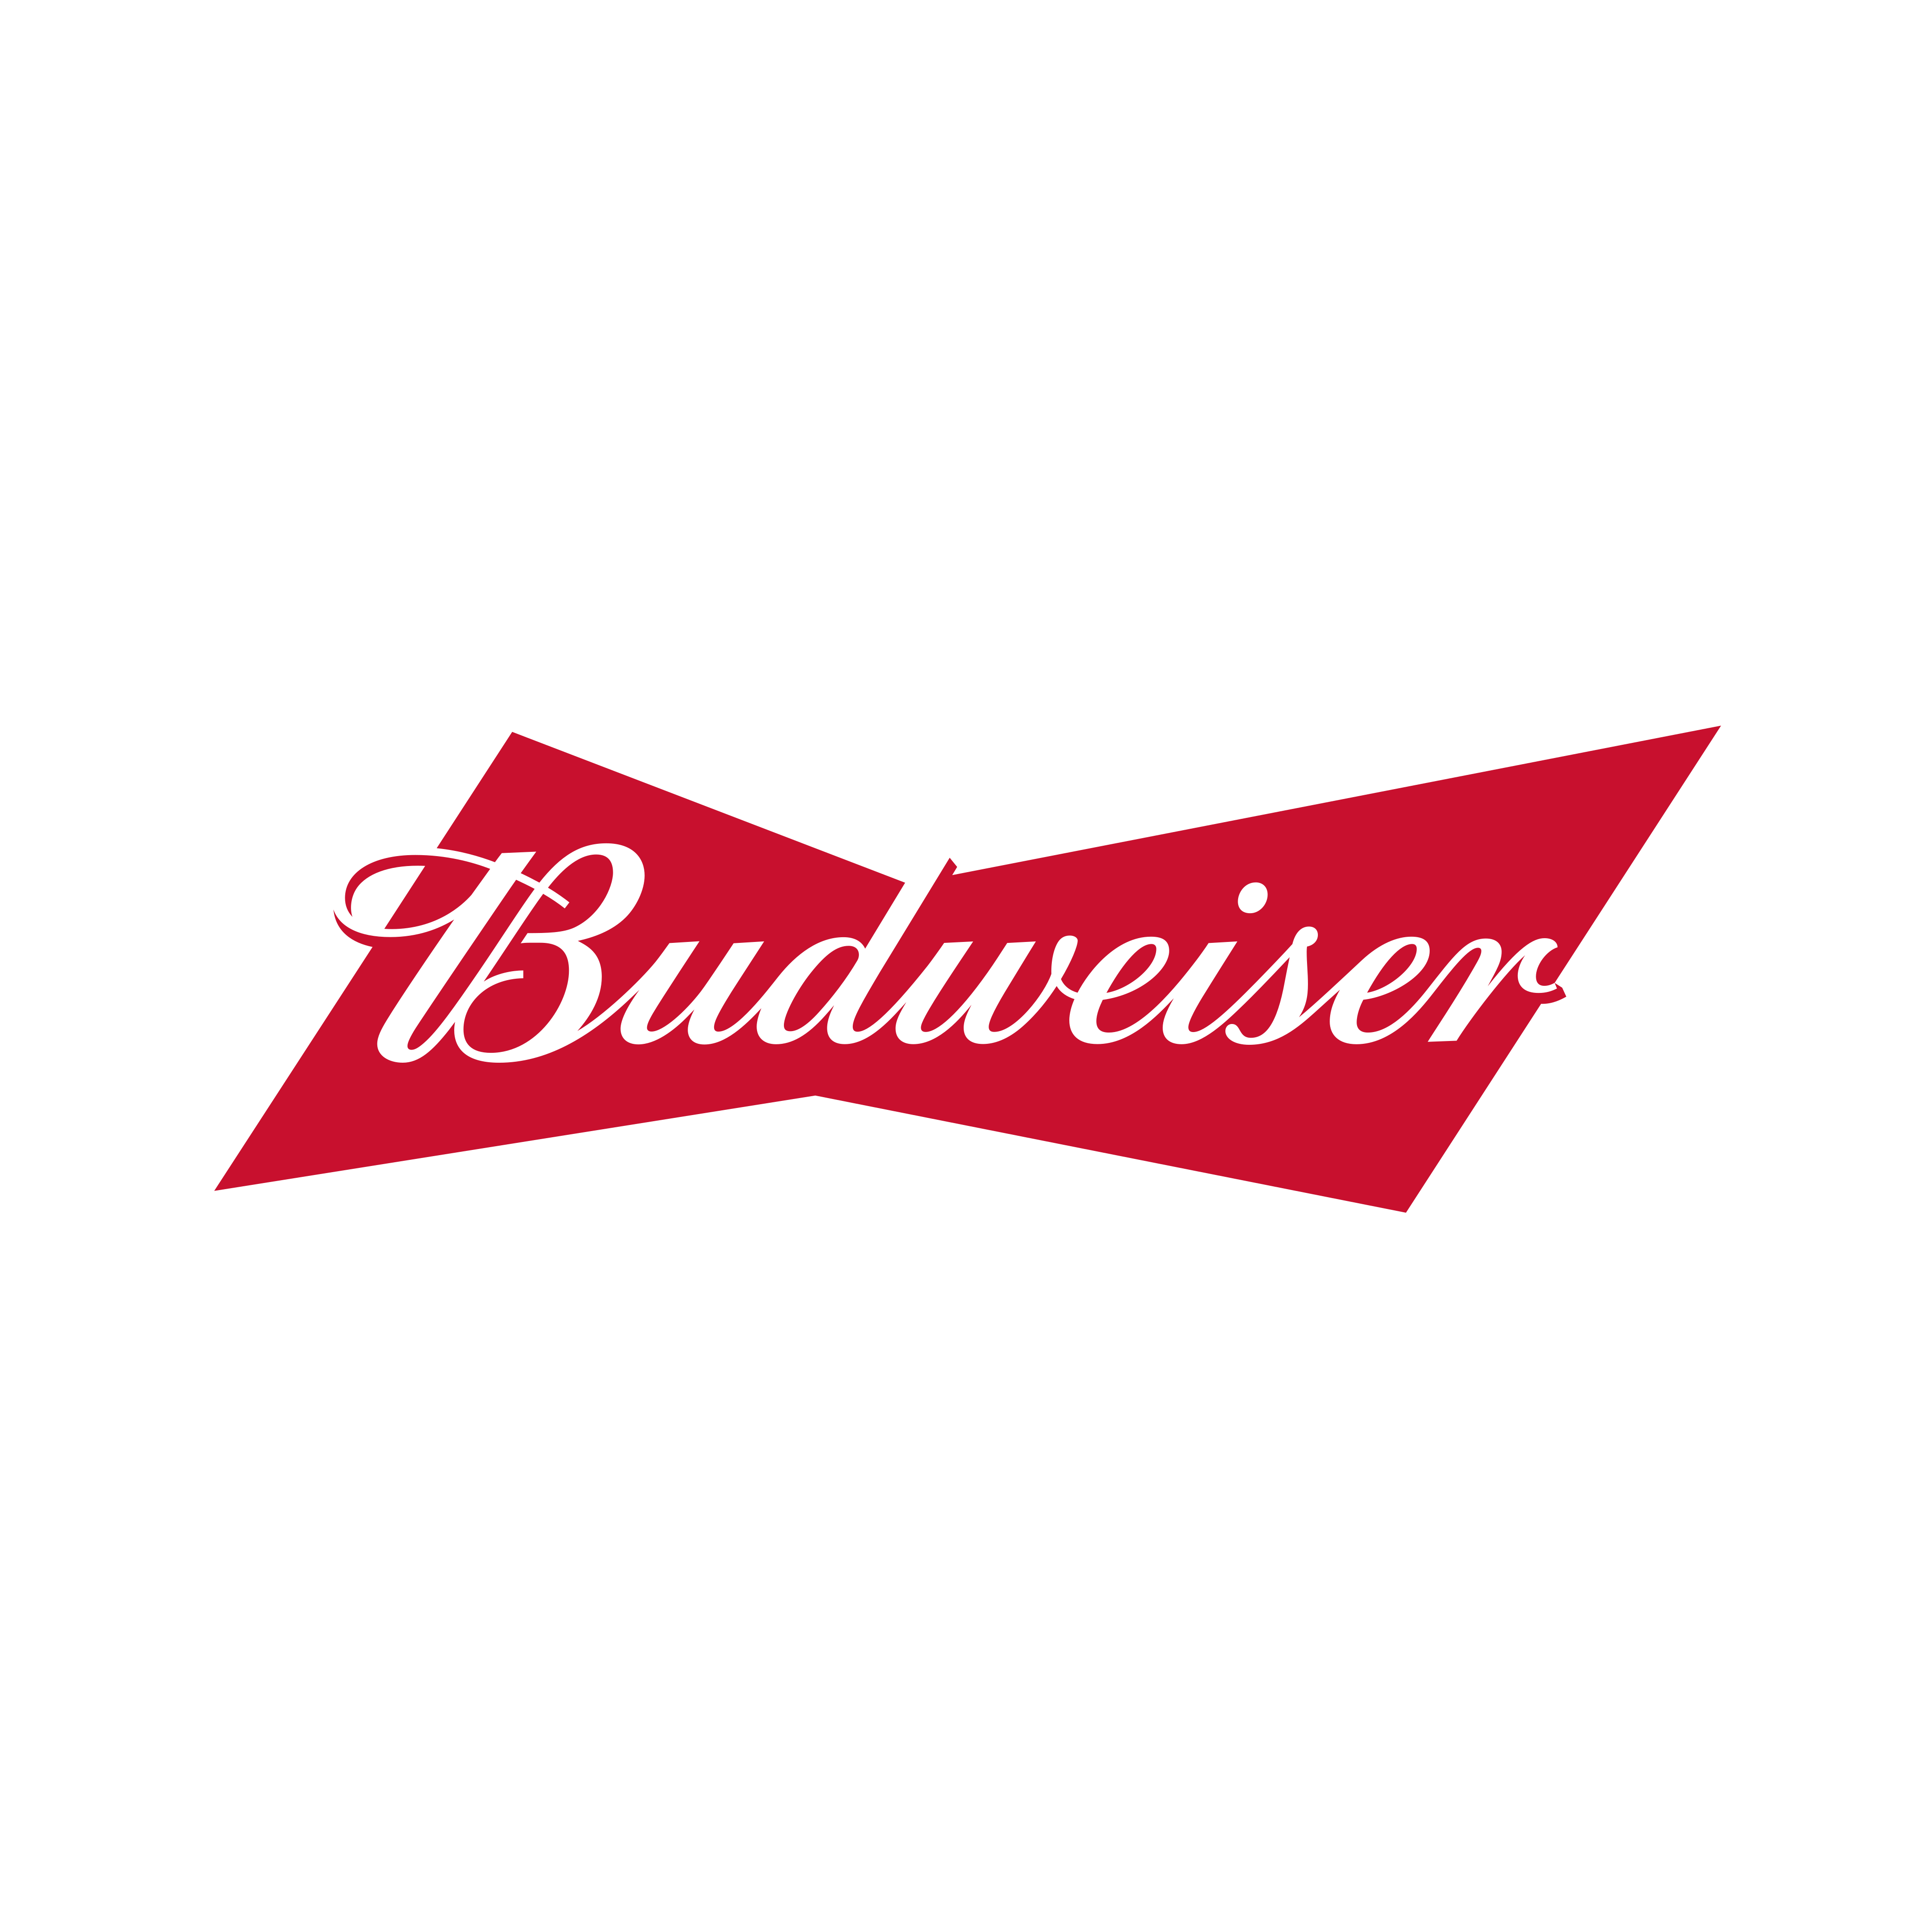 budweiser logo 0 - Budweiser Logo